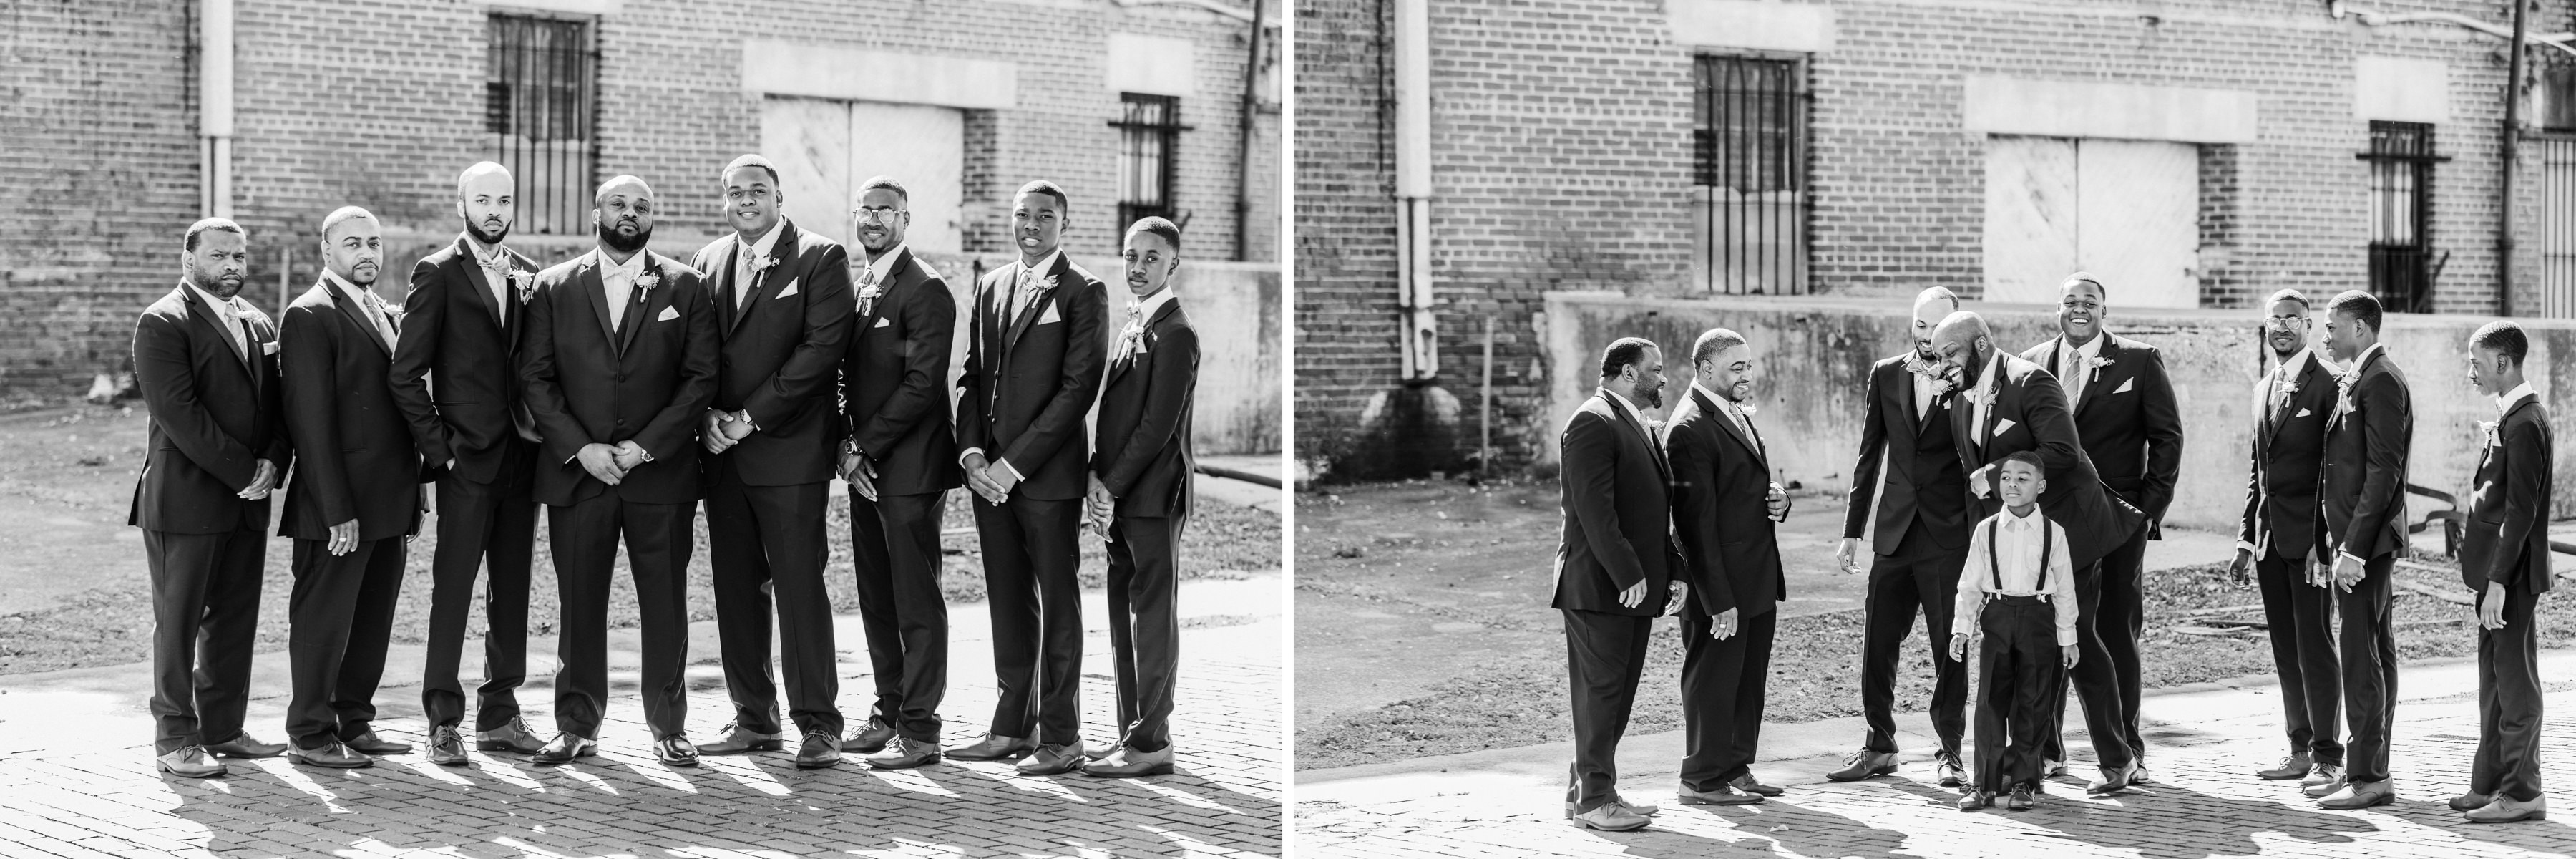 FLOWERS_WEDDING_SELMA_ALABAMA_WEDDING_PHOTOGRAPHY_59